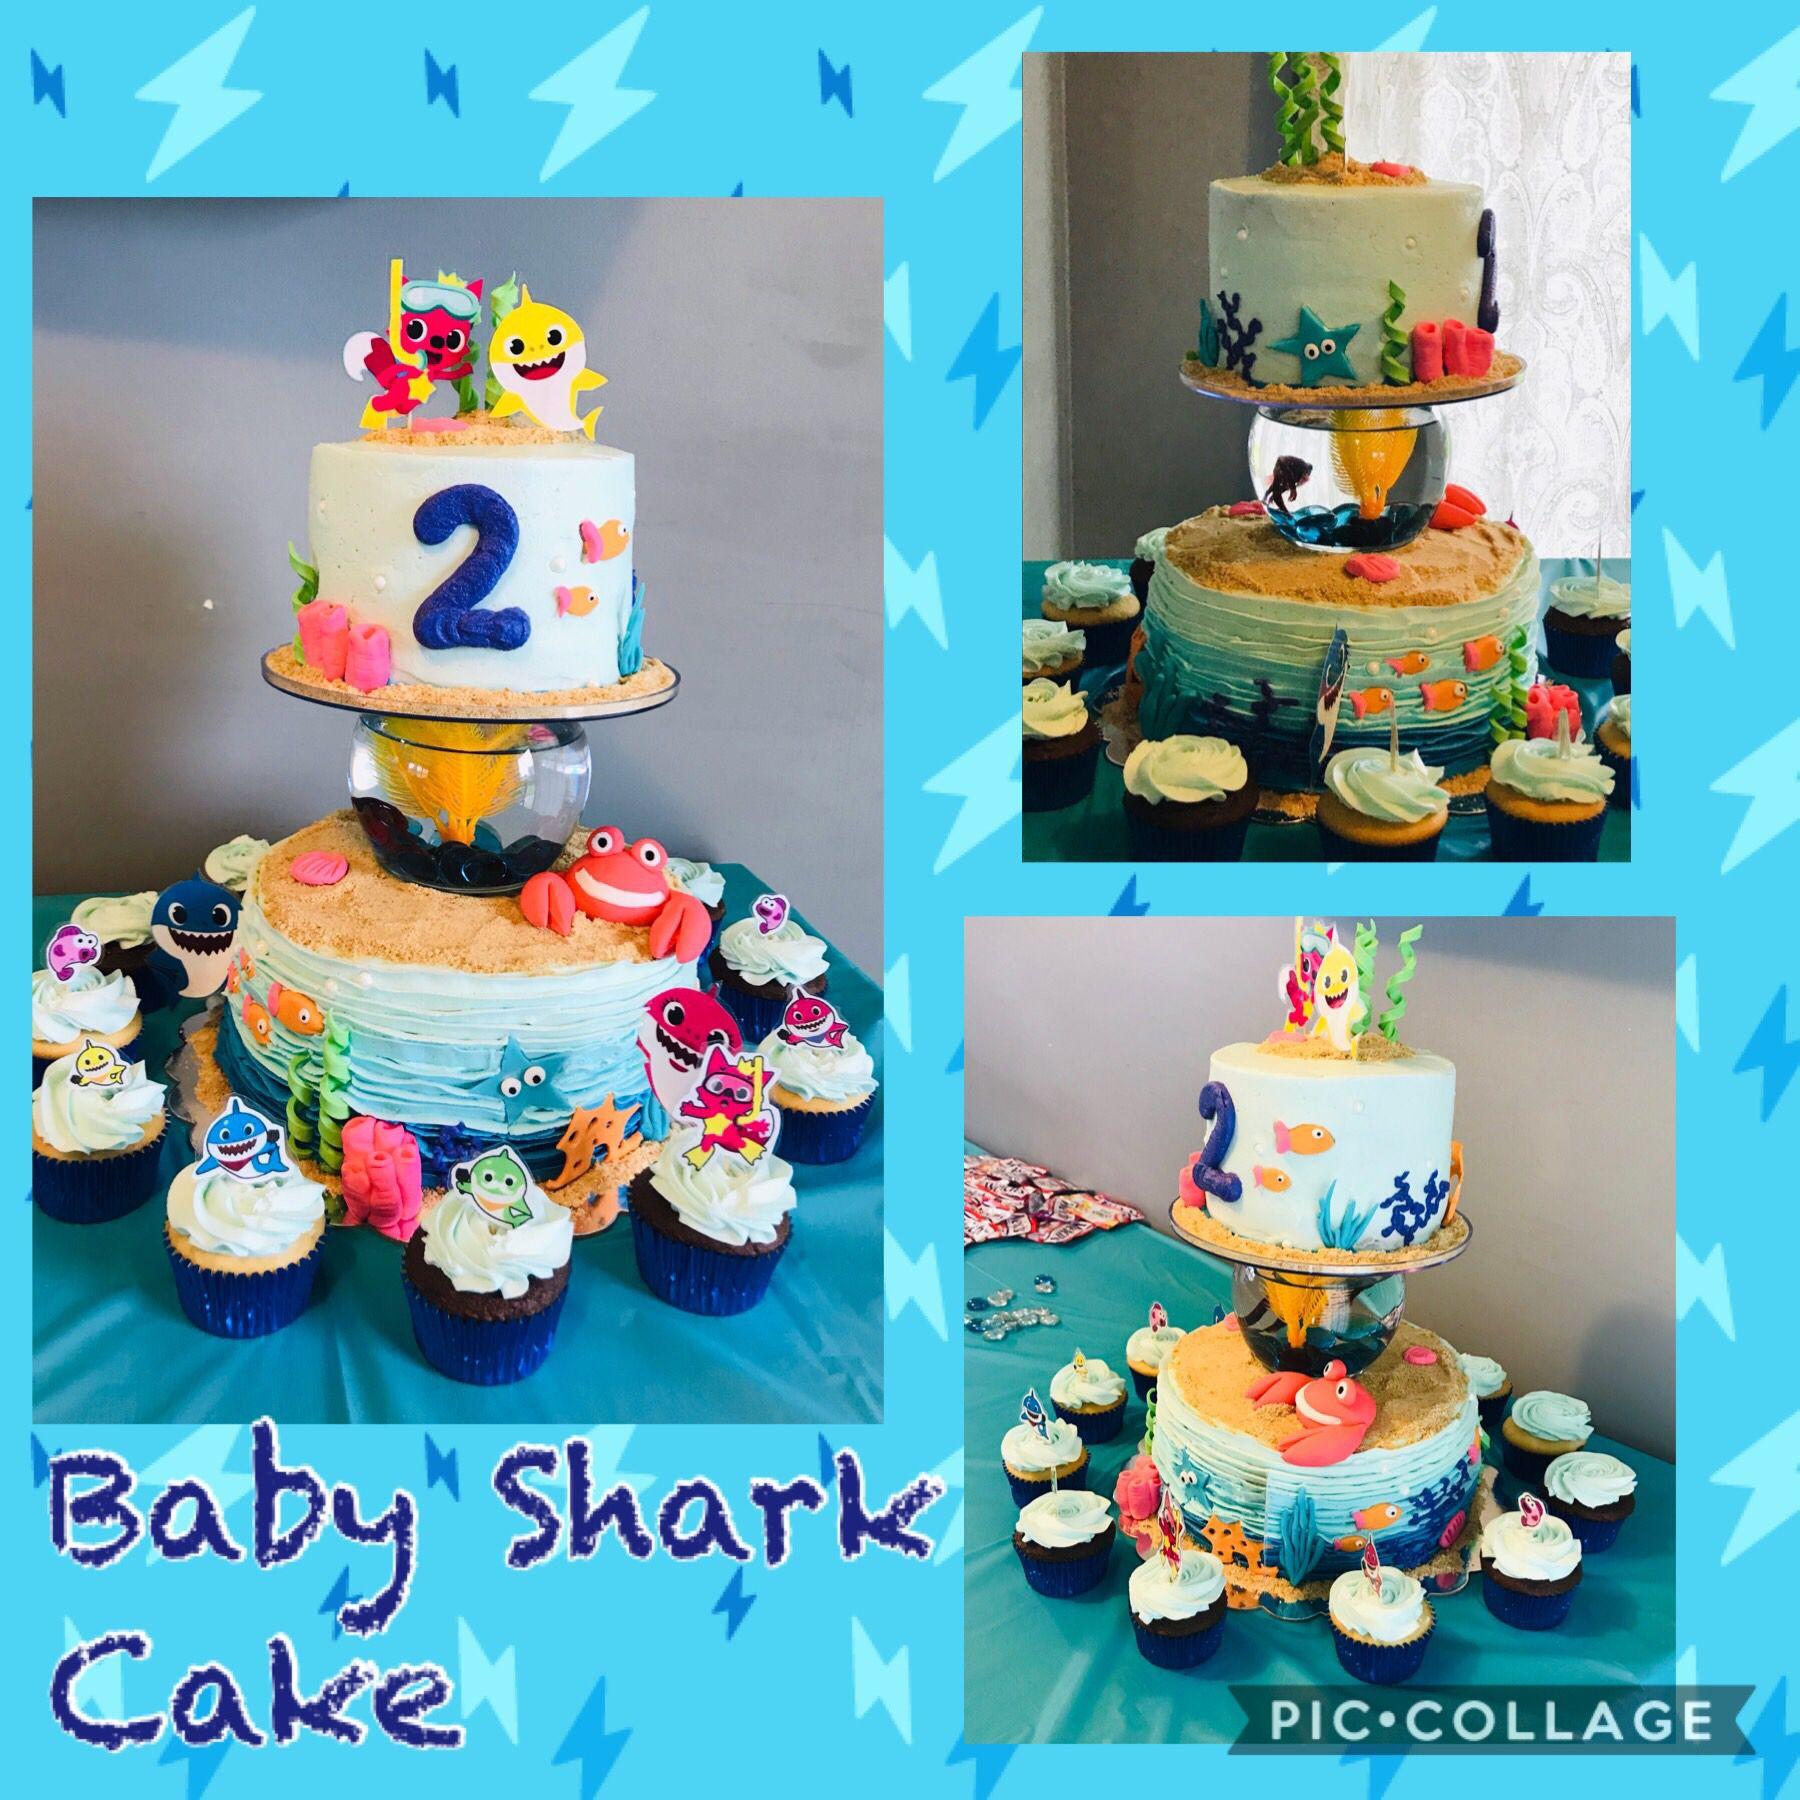 Baby shark cake with live beta fish in bowl shark cake